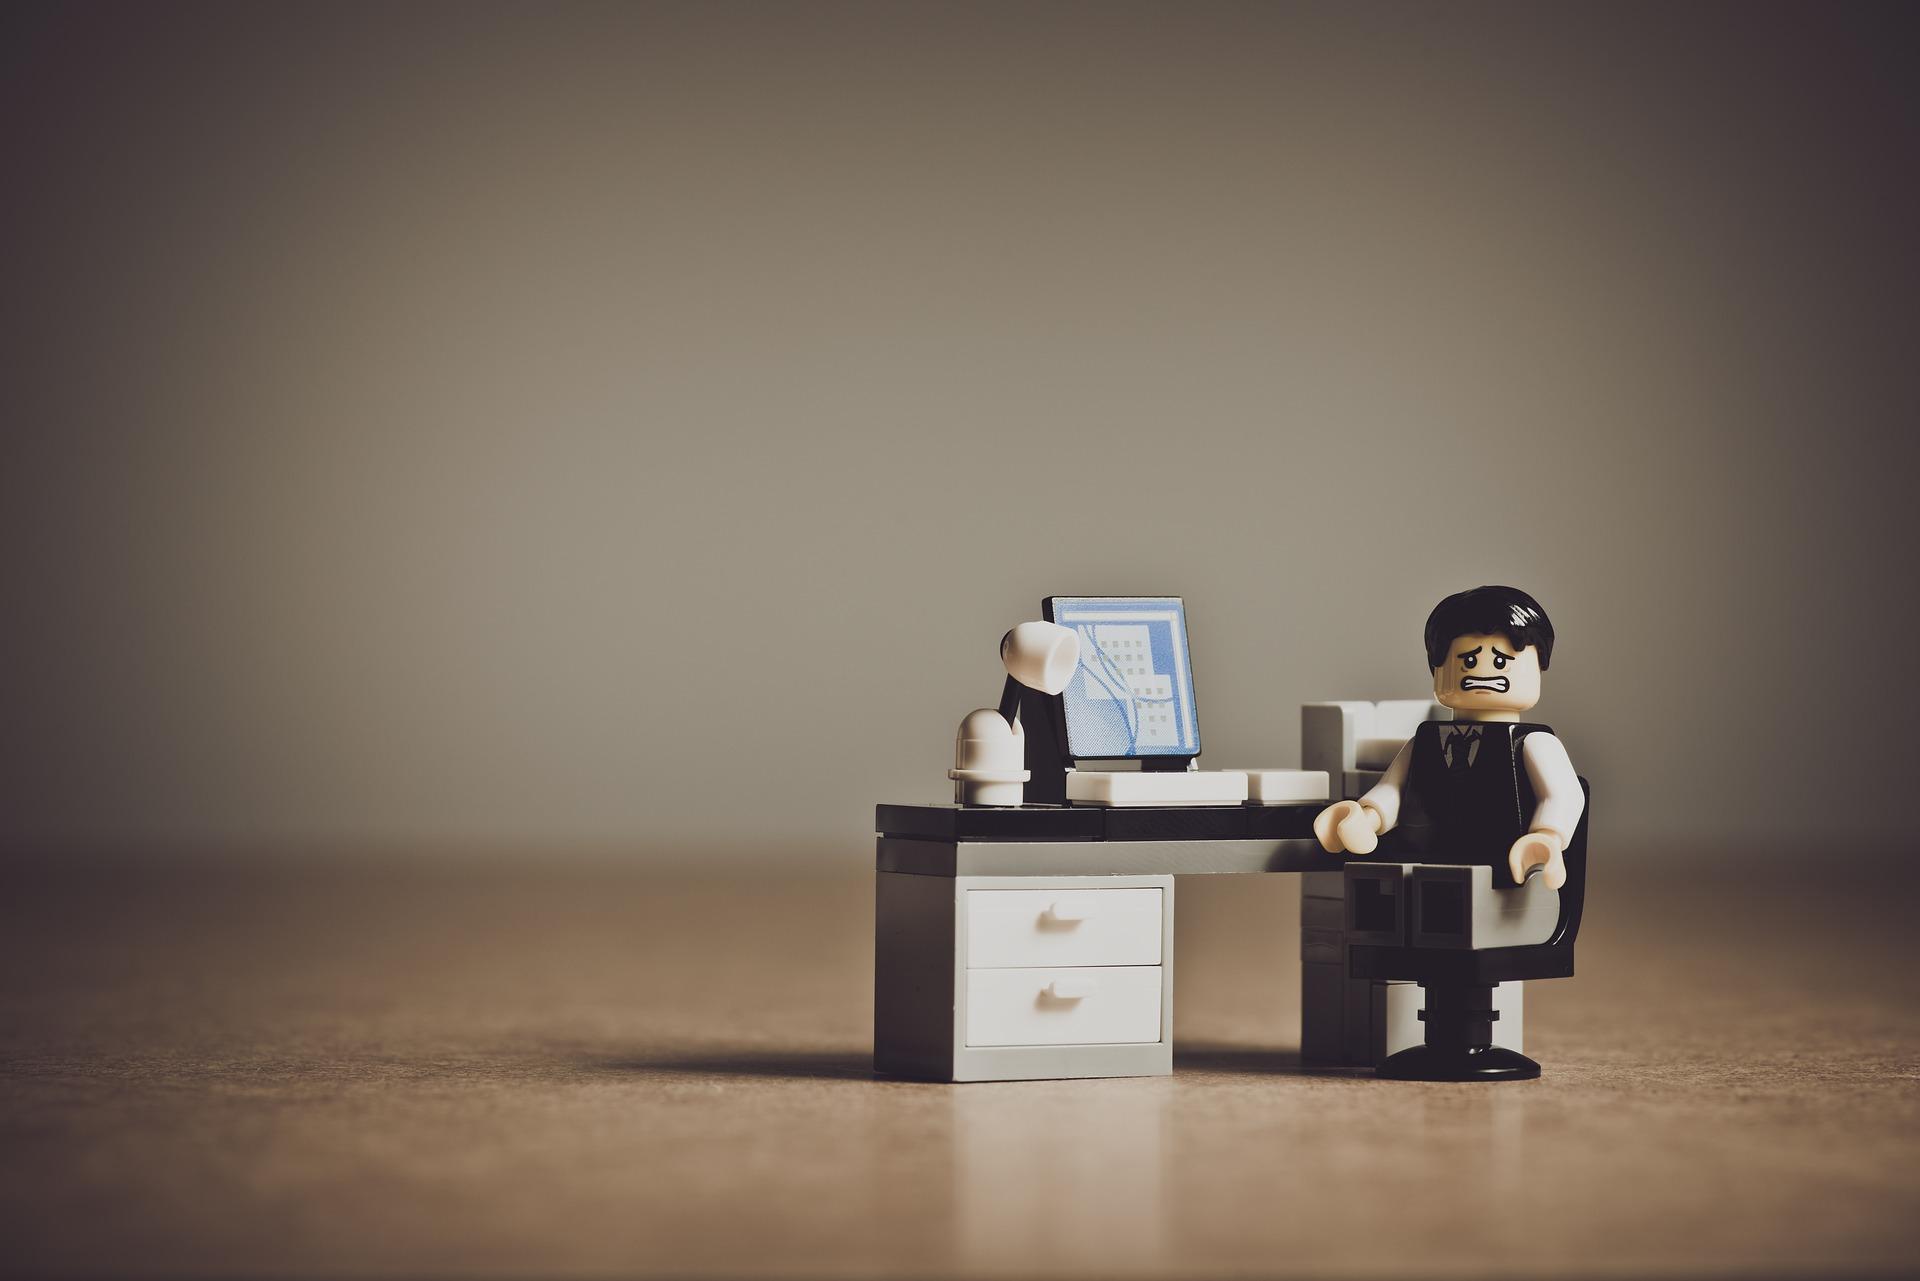 LEGOの男性がデスクに座り険しい表情をしている